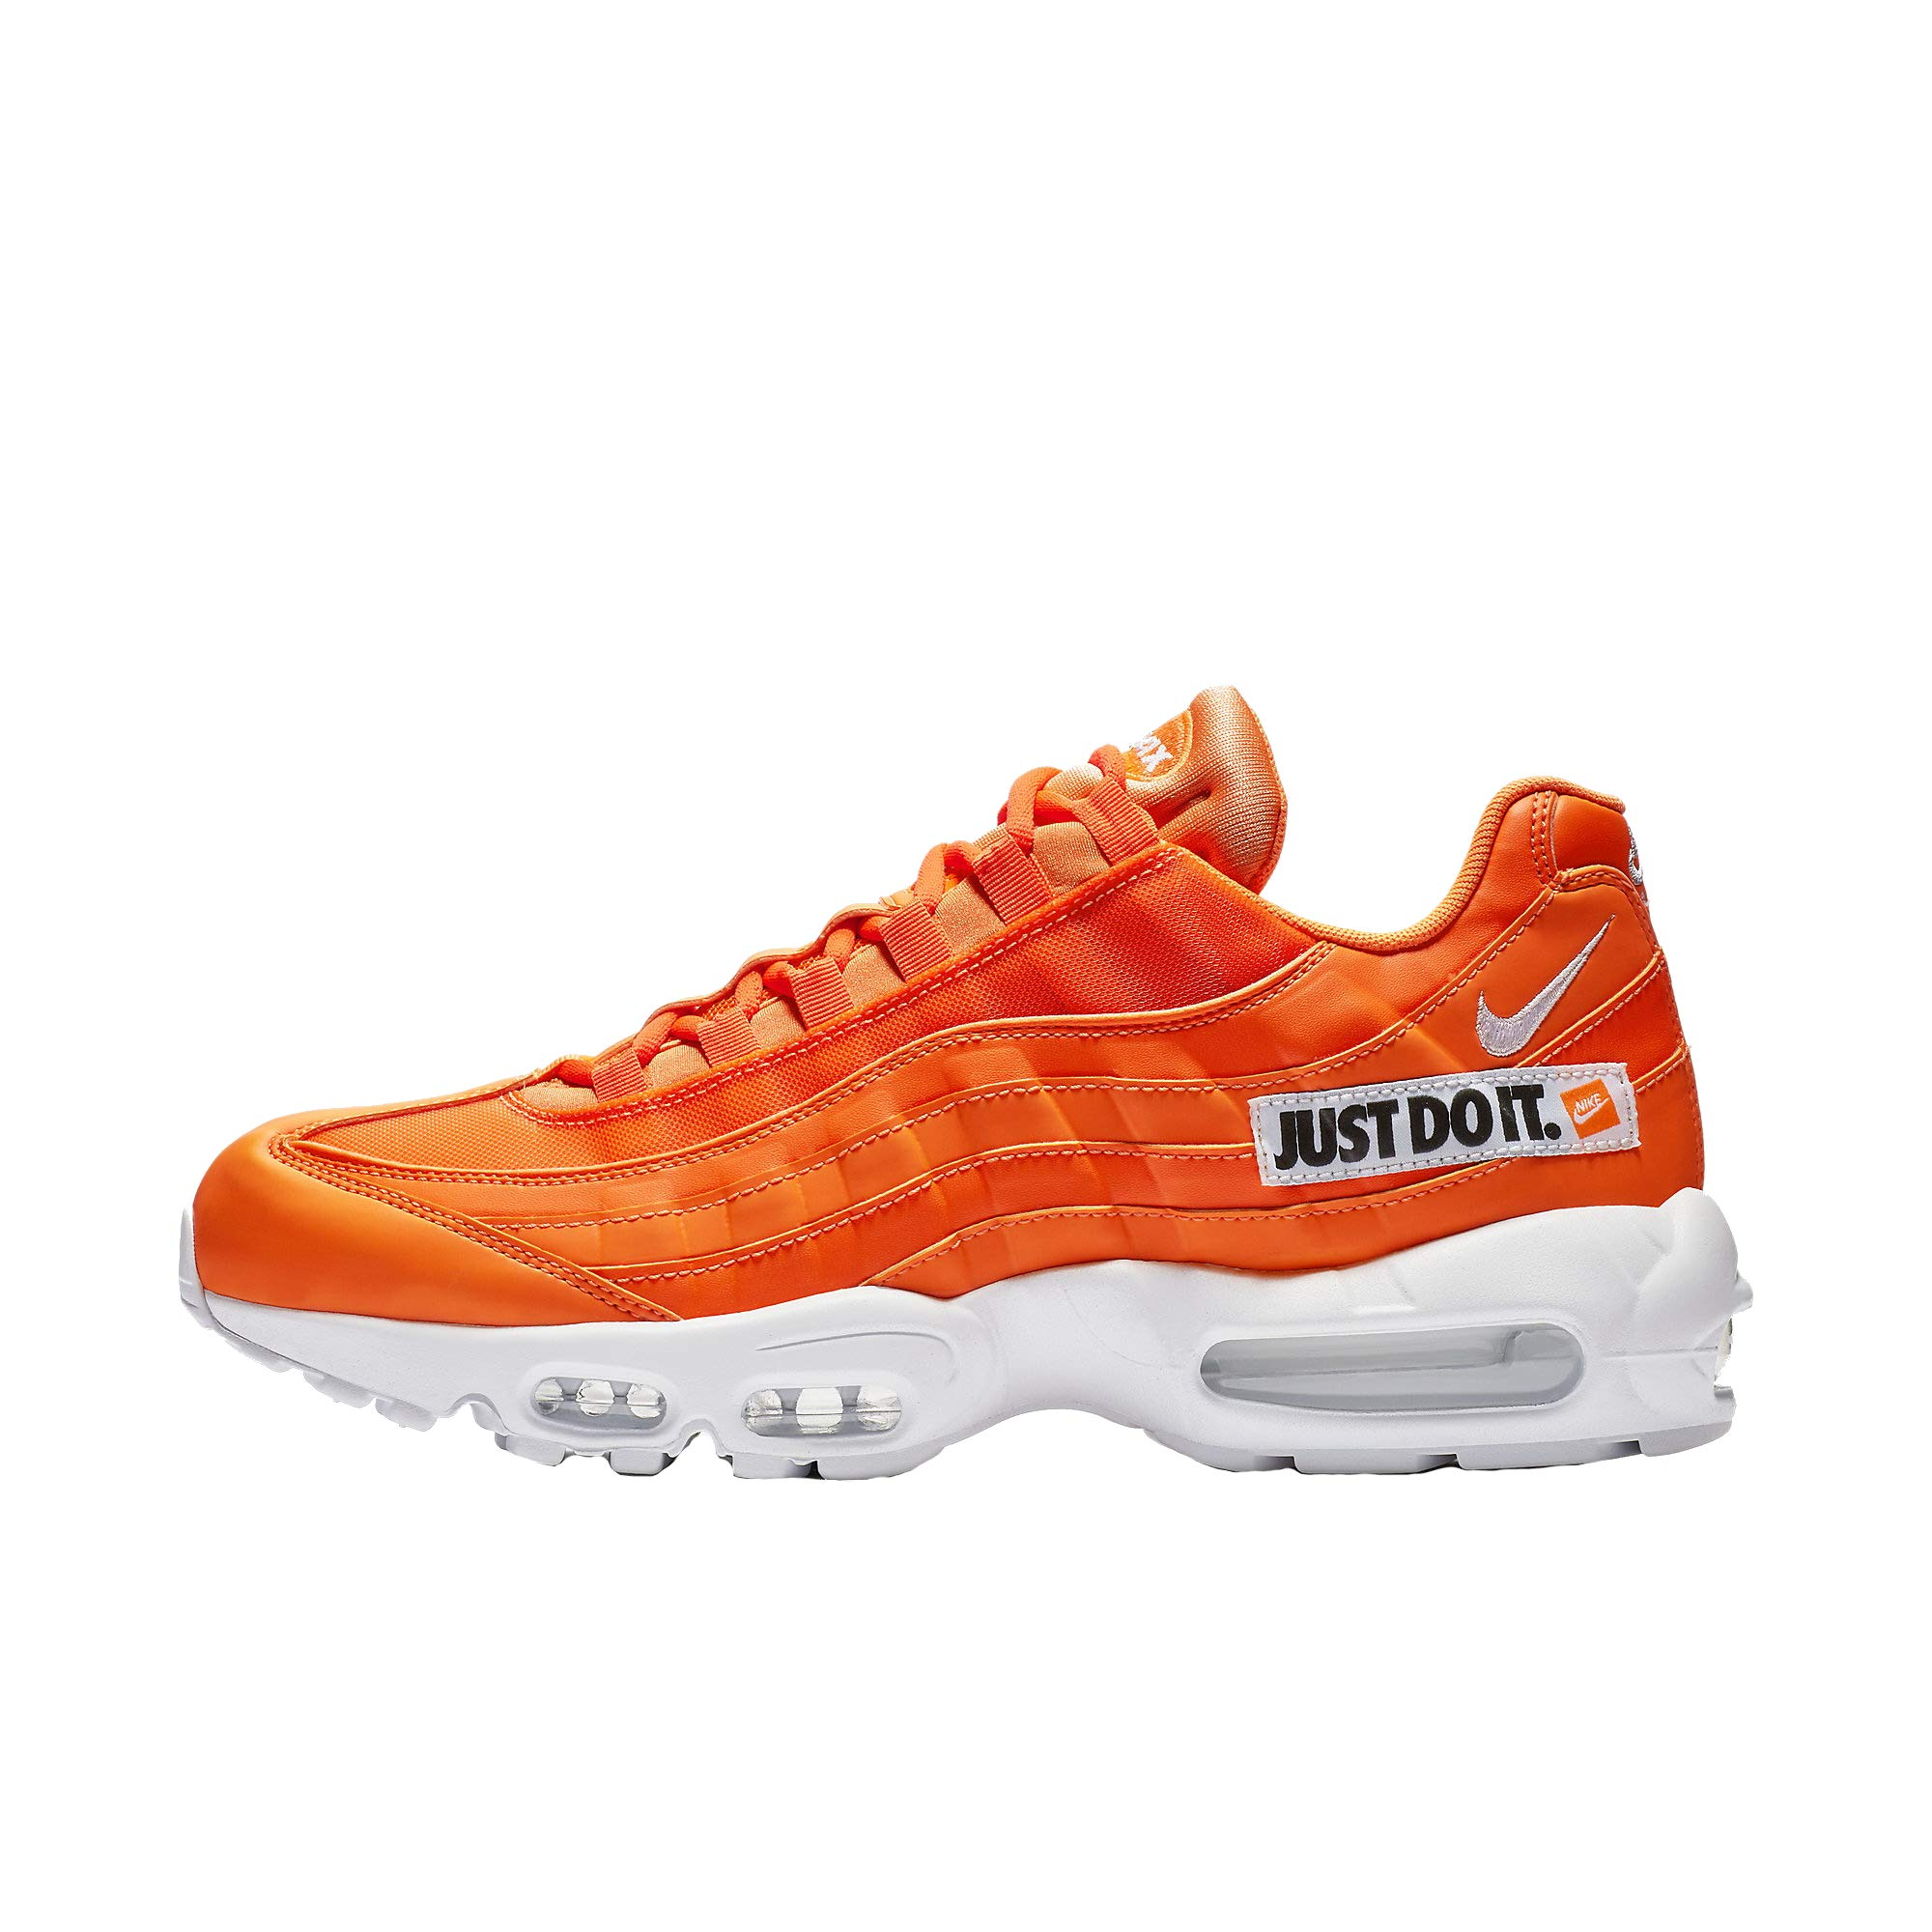 Galleon NIKE AIR MAX 95 SE Mens Running Sneakers AV6246